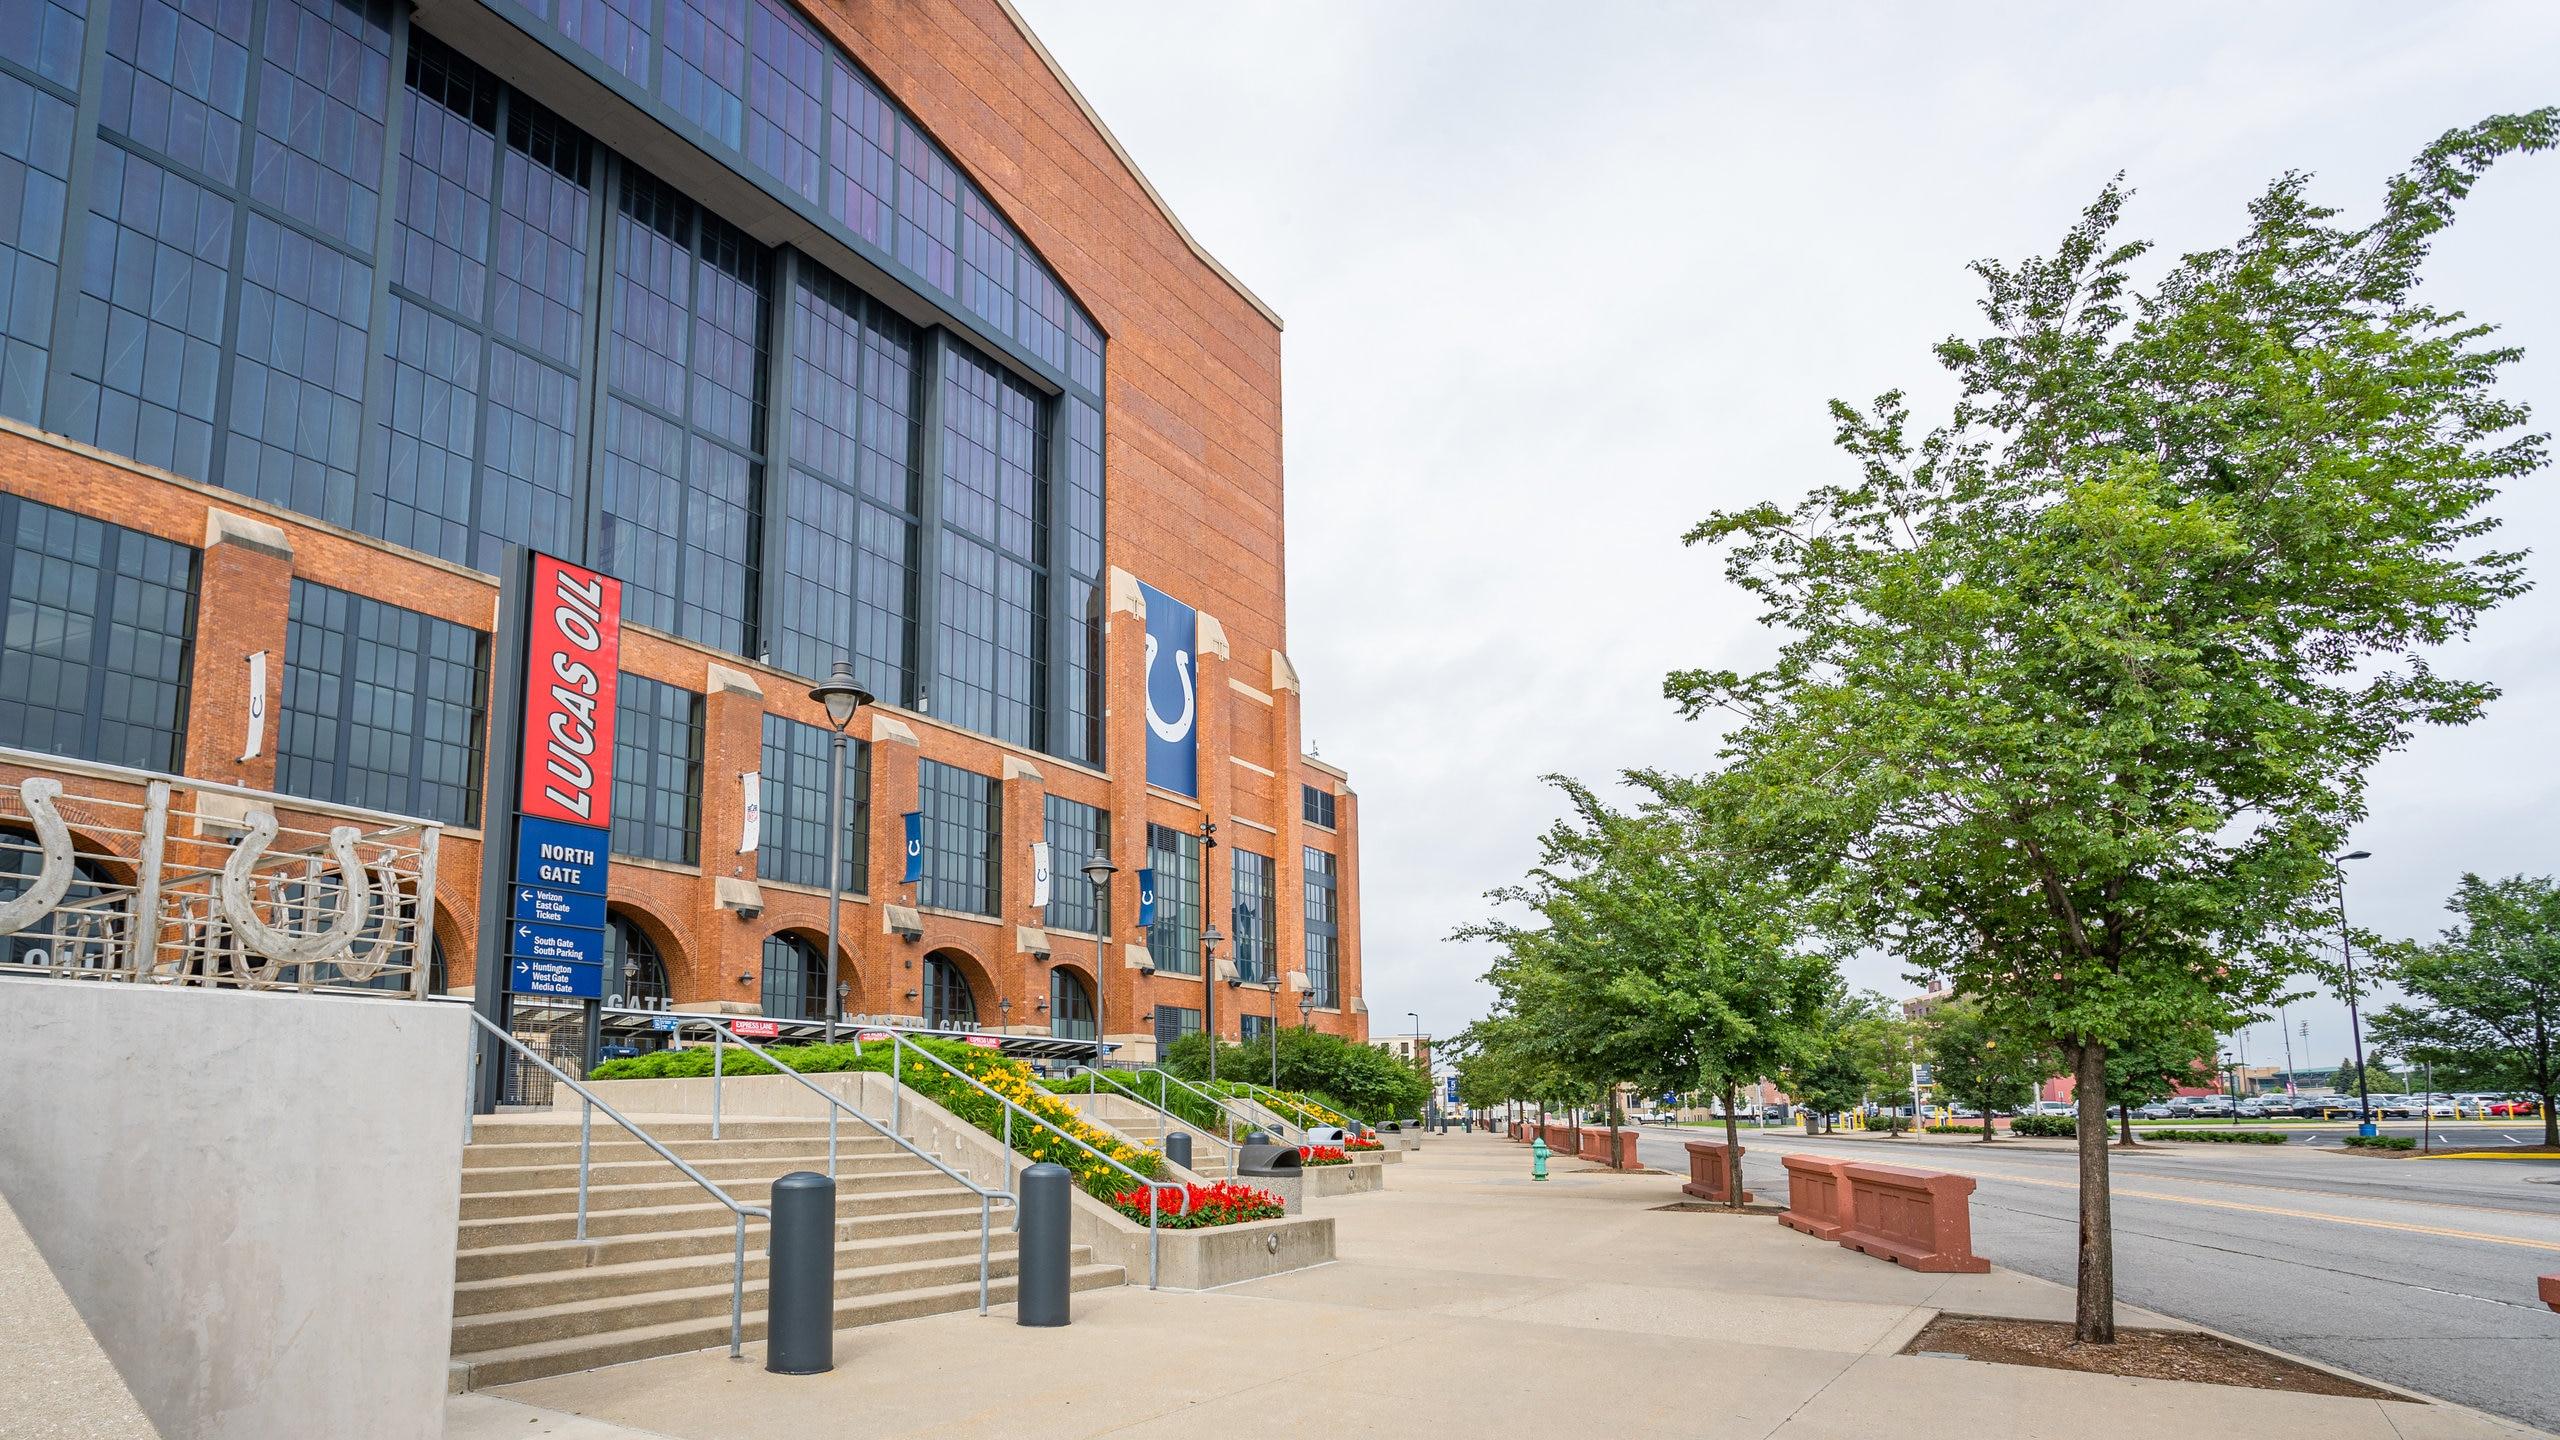 Babe Denny, Indianapolis, Indiana, Verenigde Staten